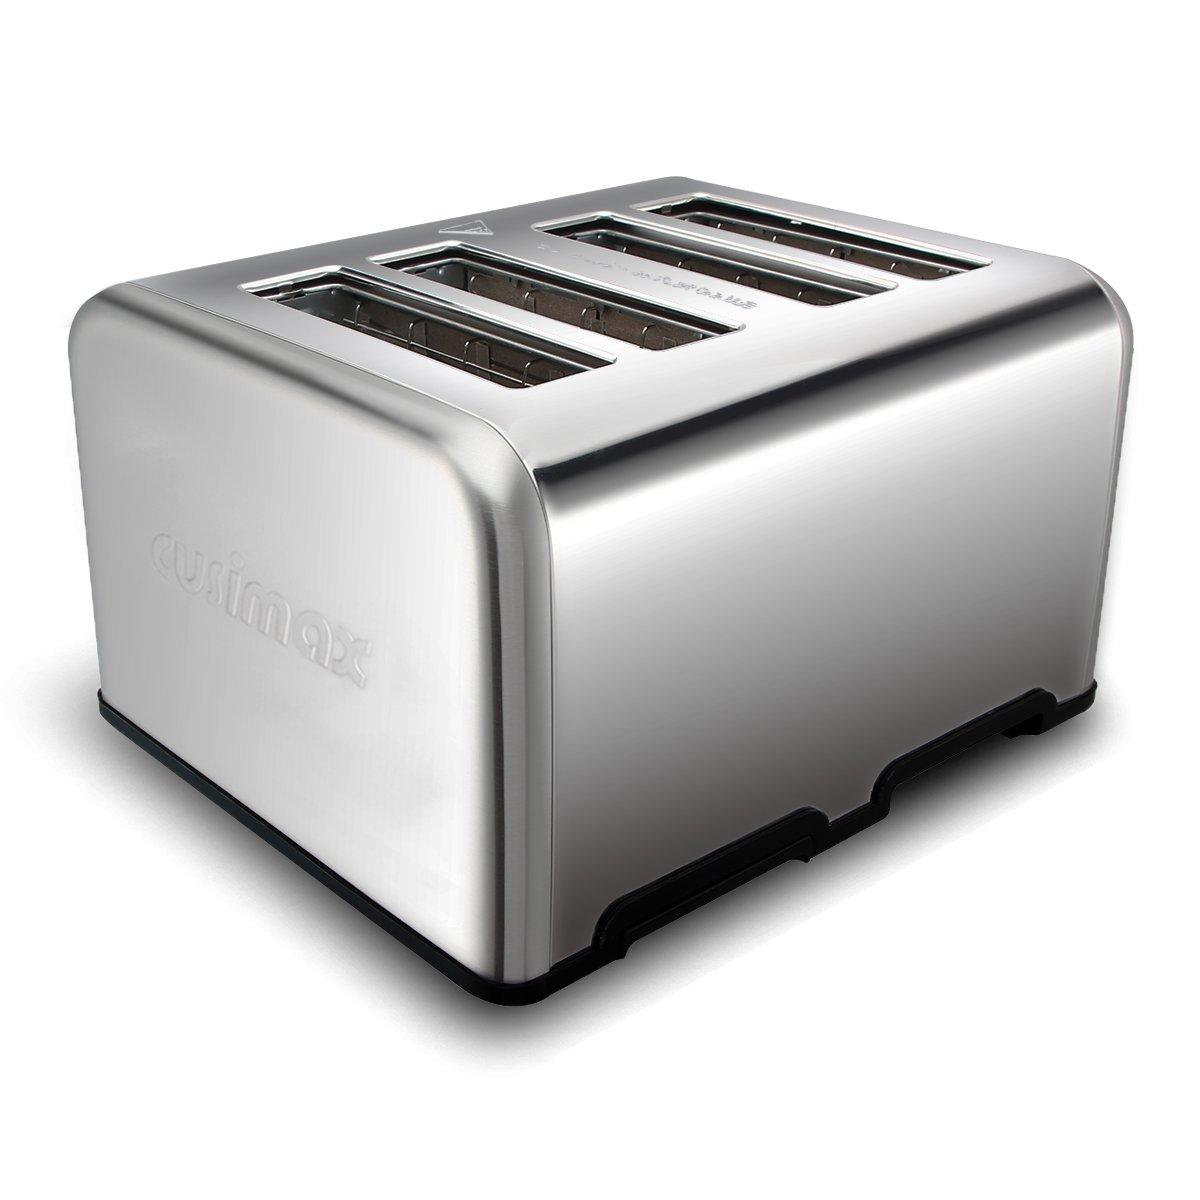 Amazon.com: Cusimax - Quemador eléctrico: Kitchen & Dining